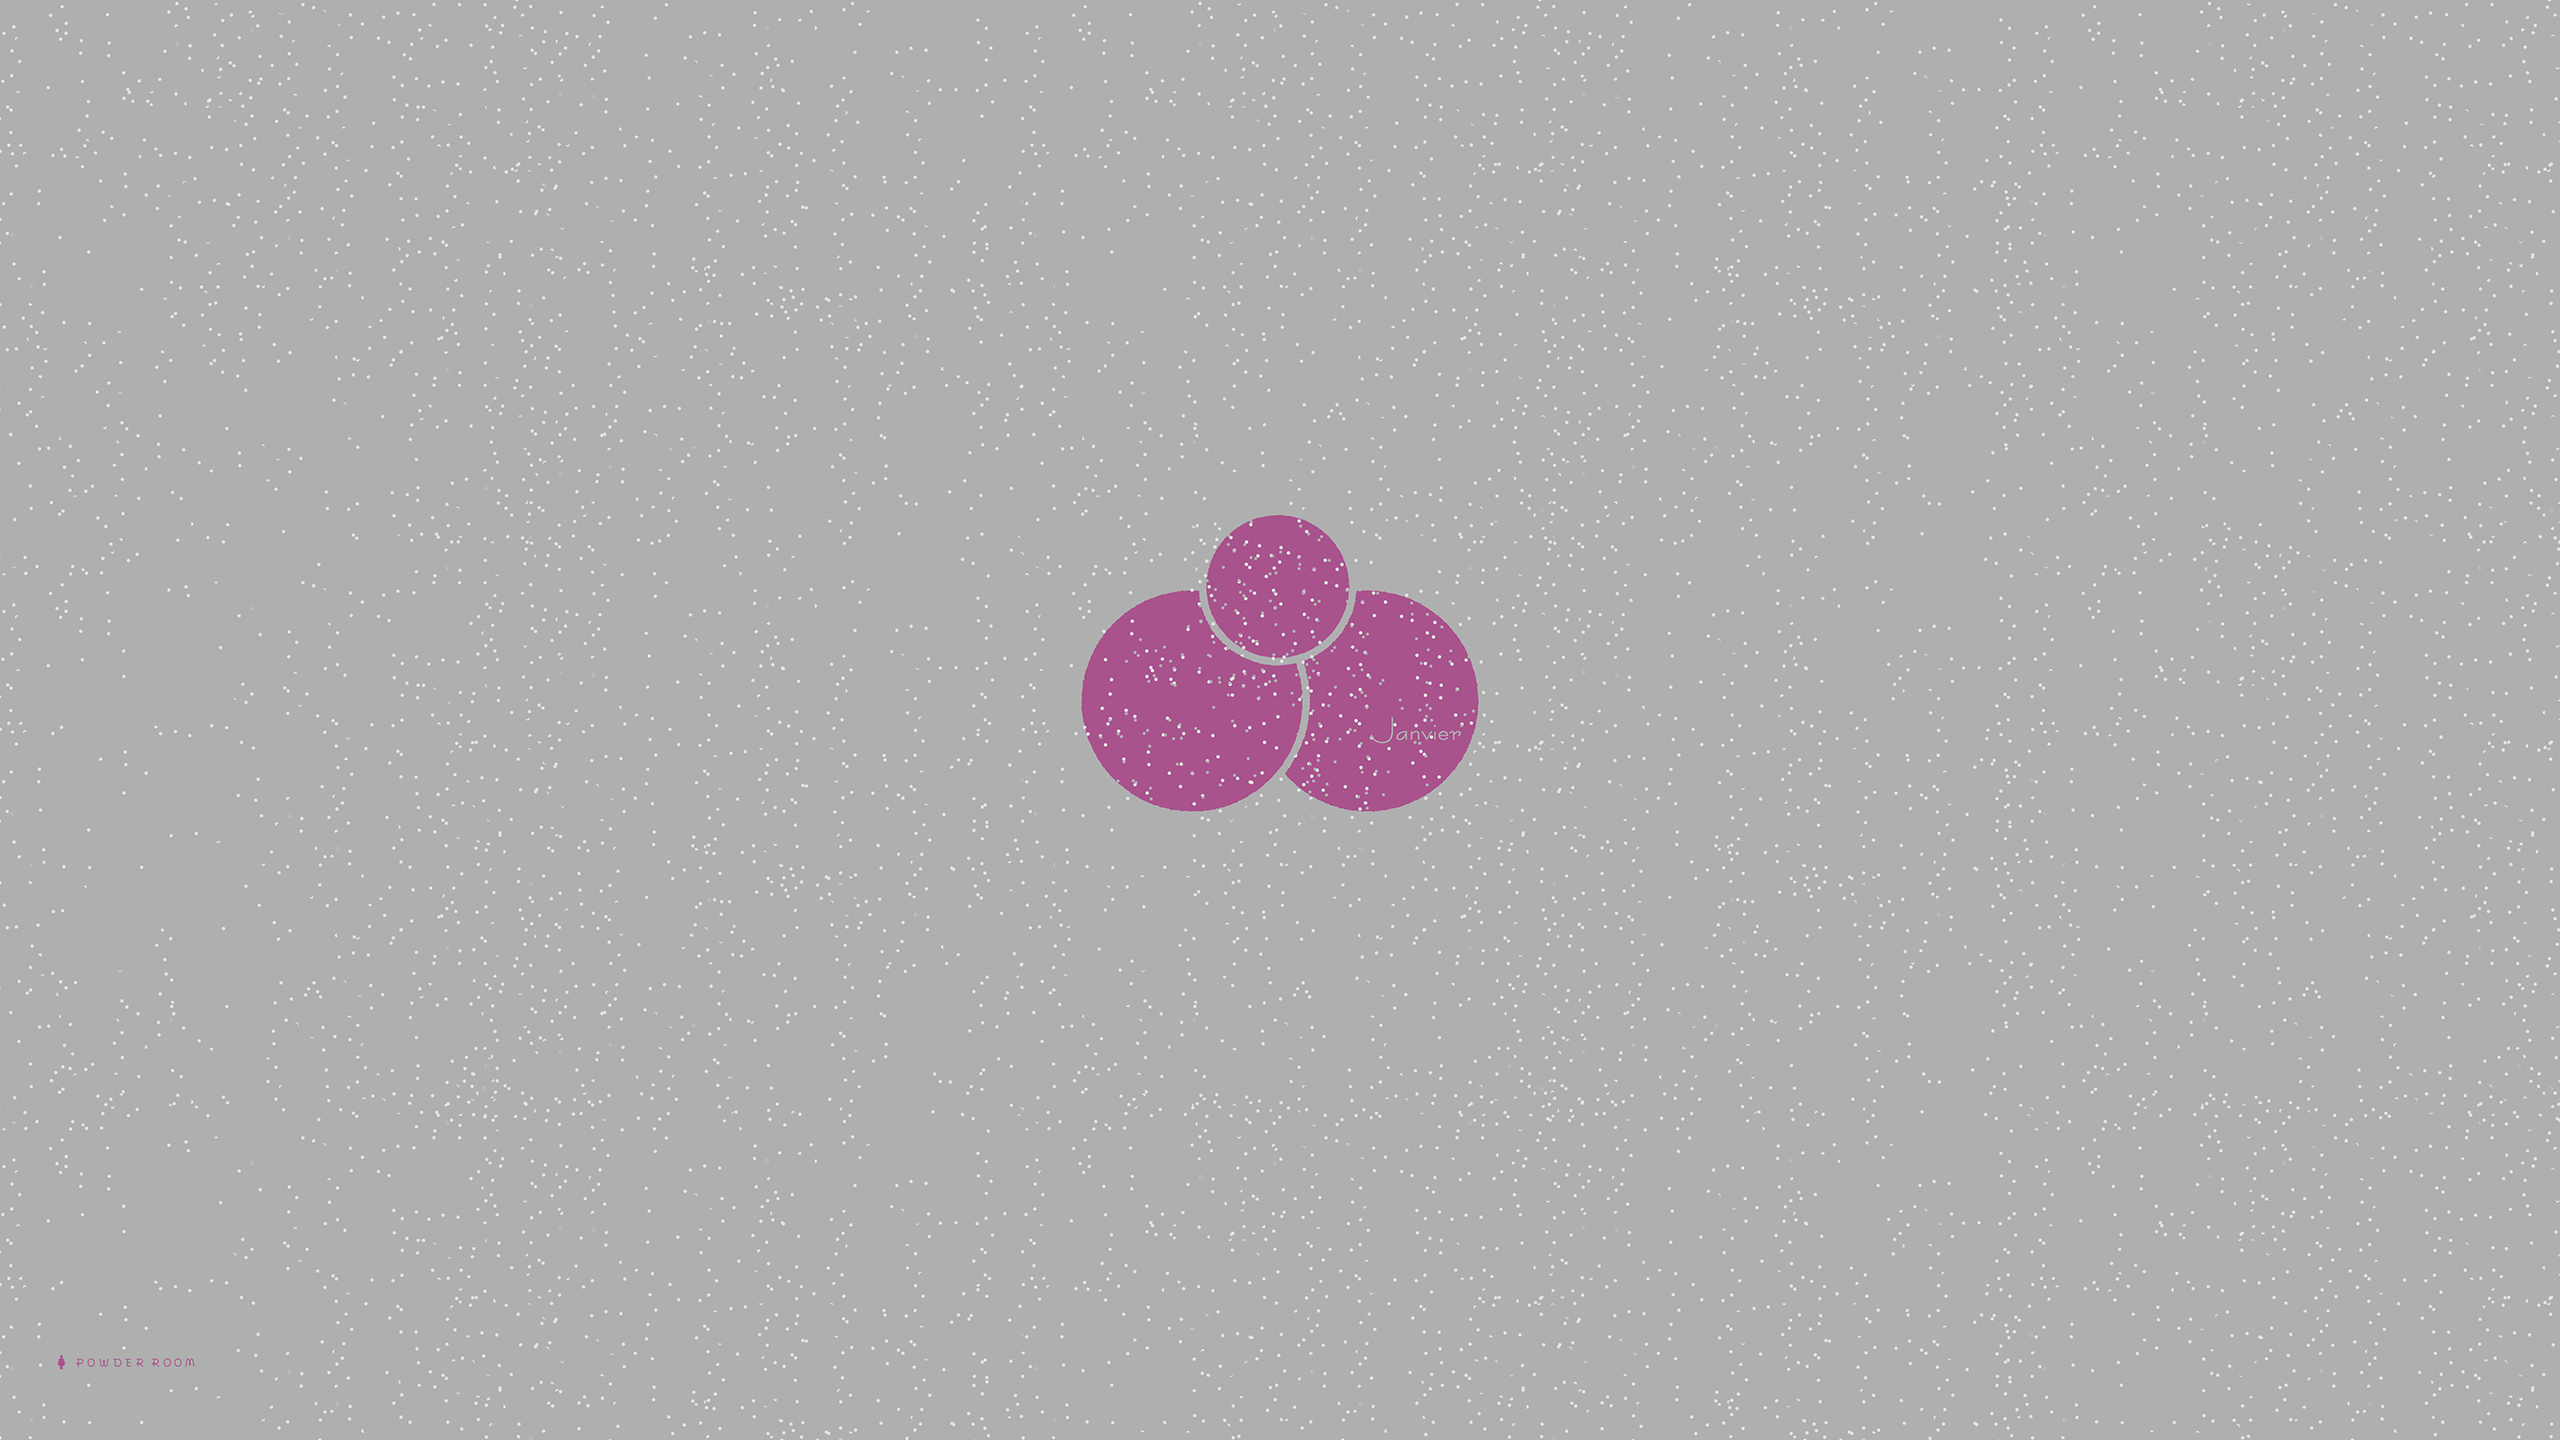 Free Desktop Wallpaper 壁紙 おしゃれ Pc デスクトップ ピンク Pink